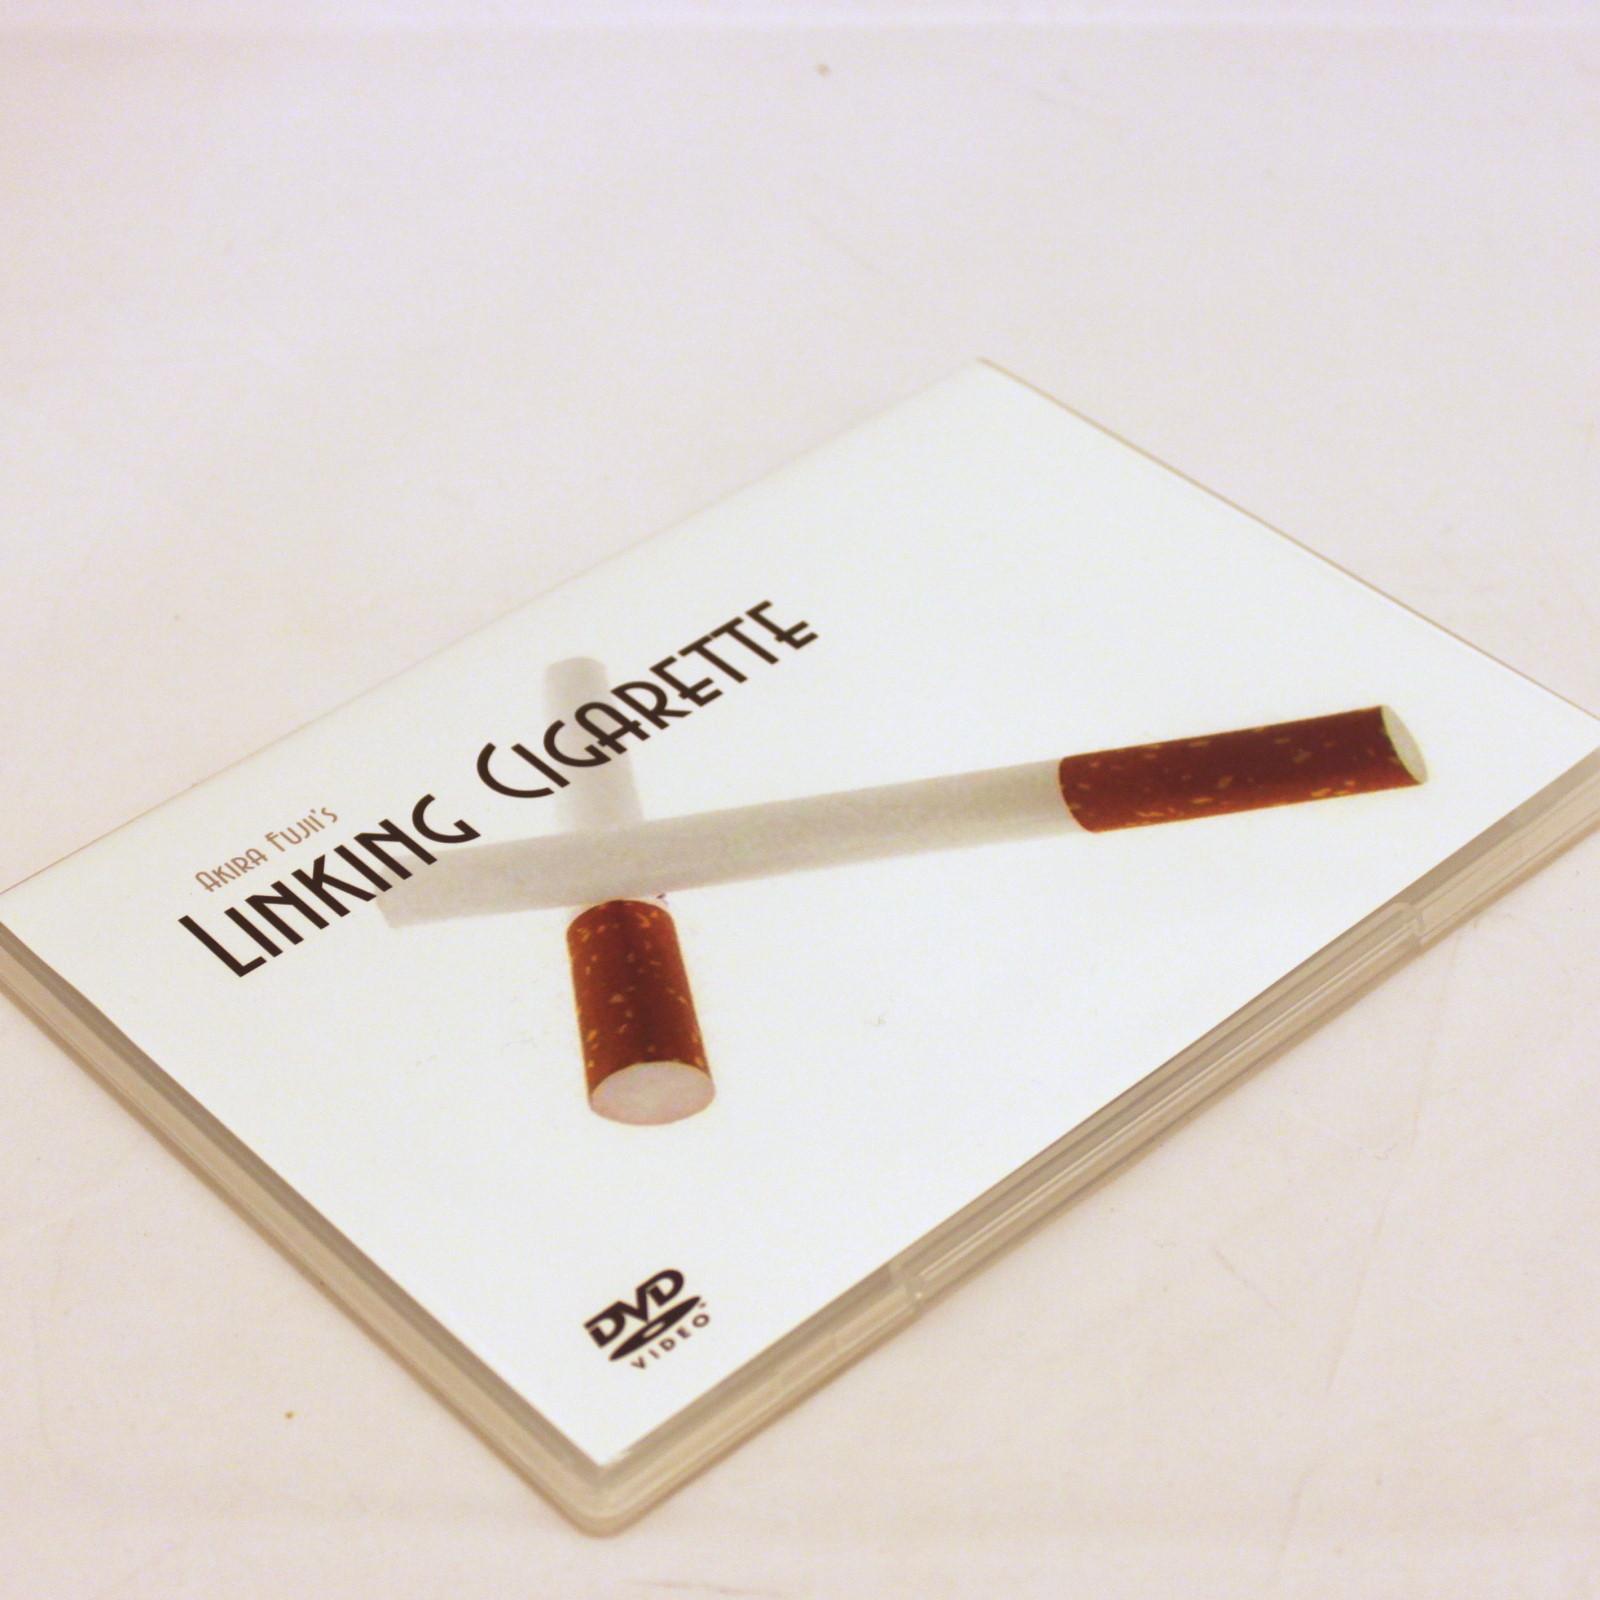 Linking Cigarette by Akira Fujii